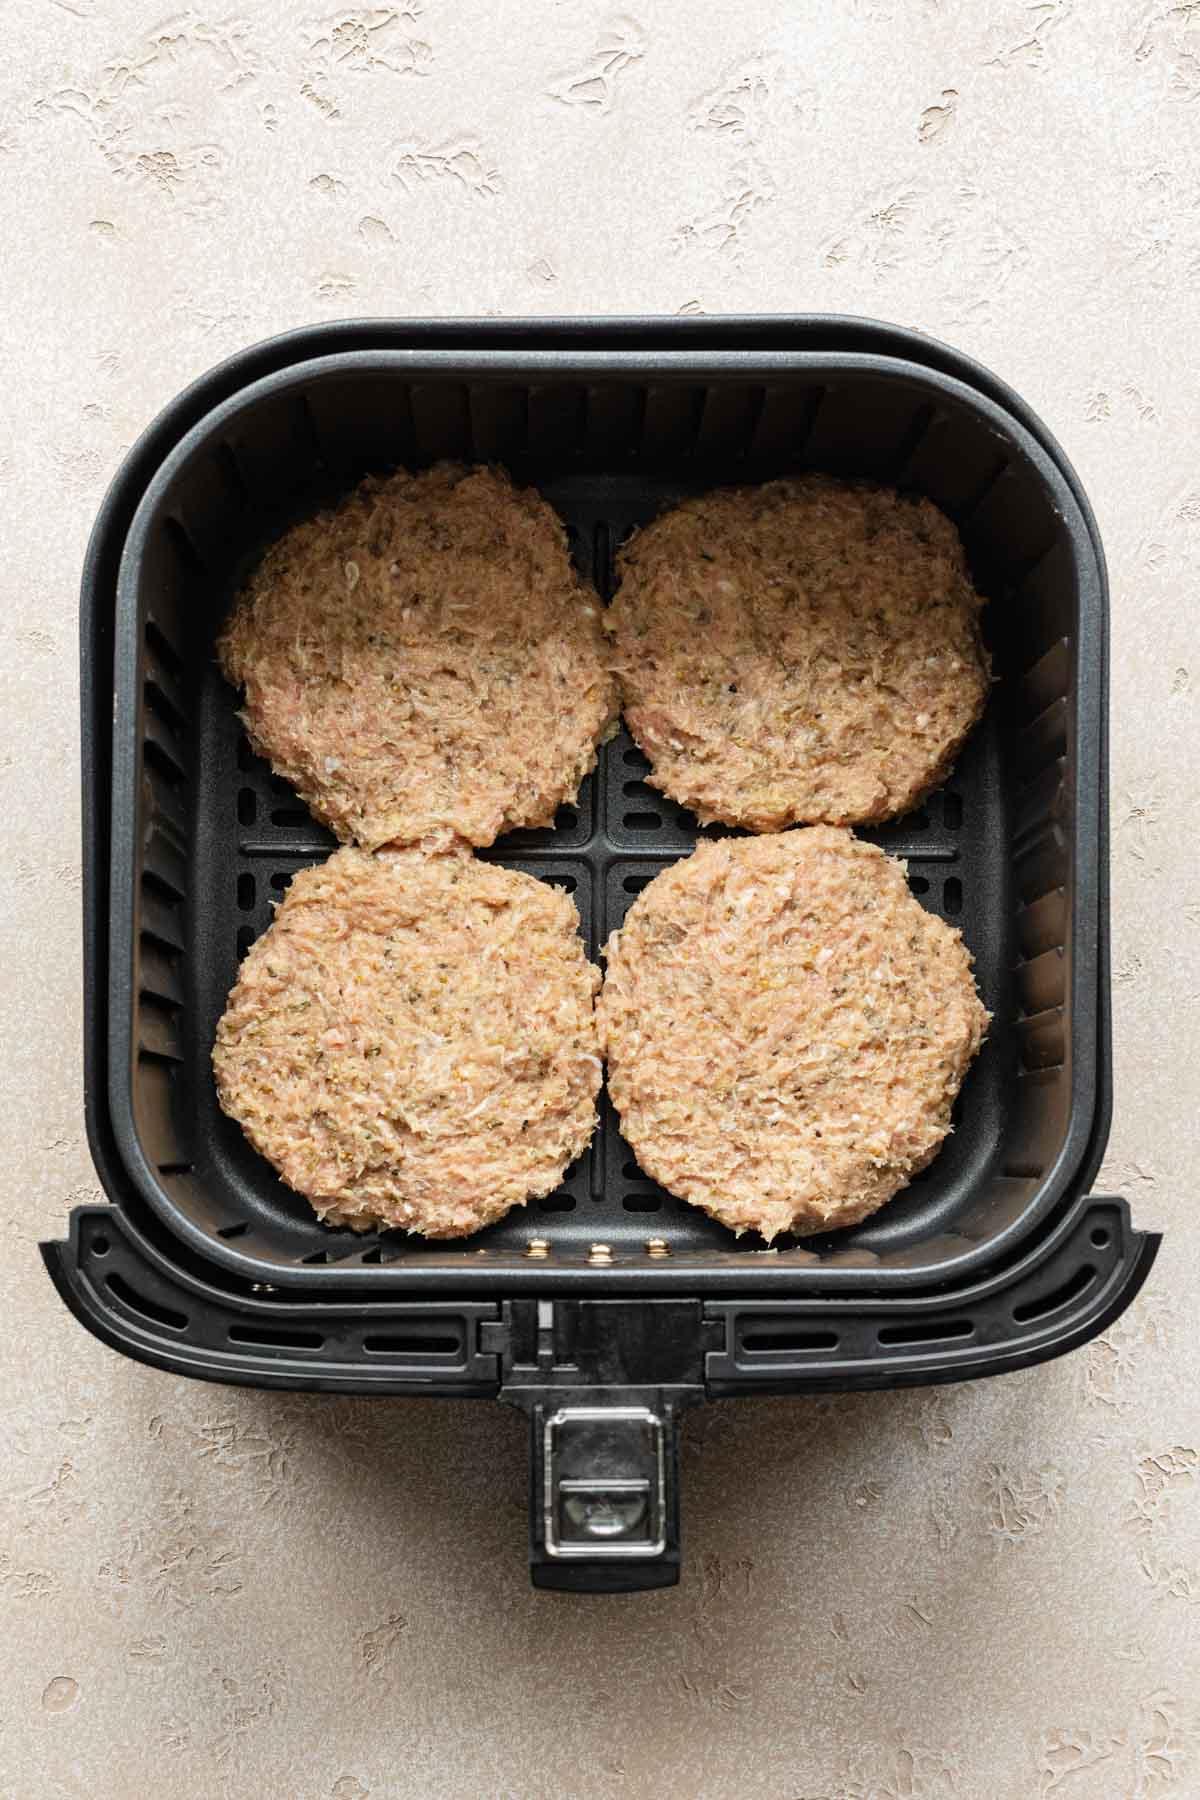 Four turkey burger patties in an air fryer basket.